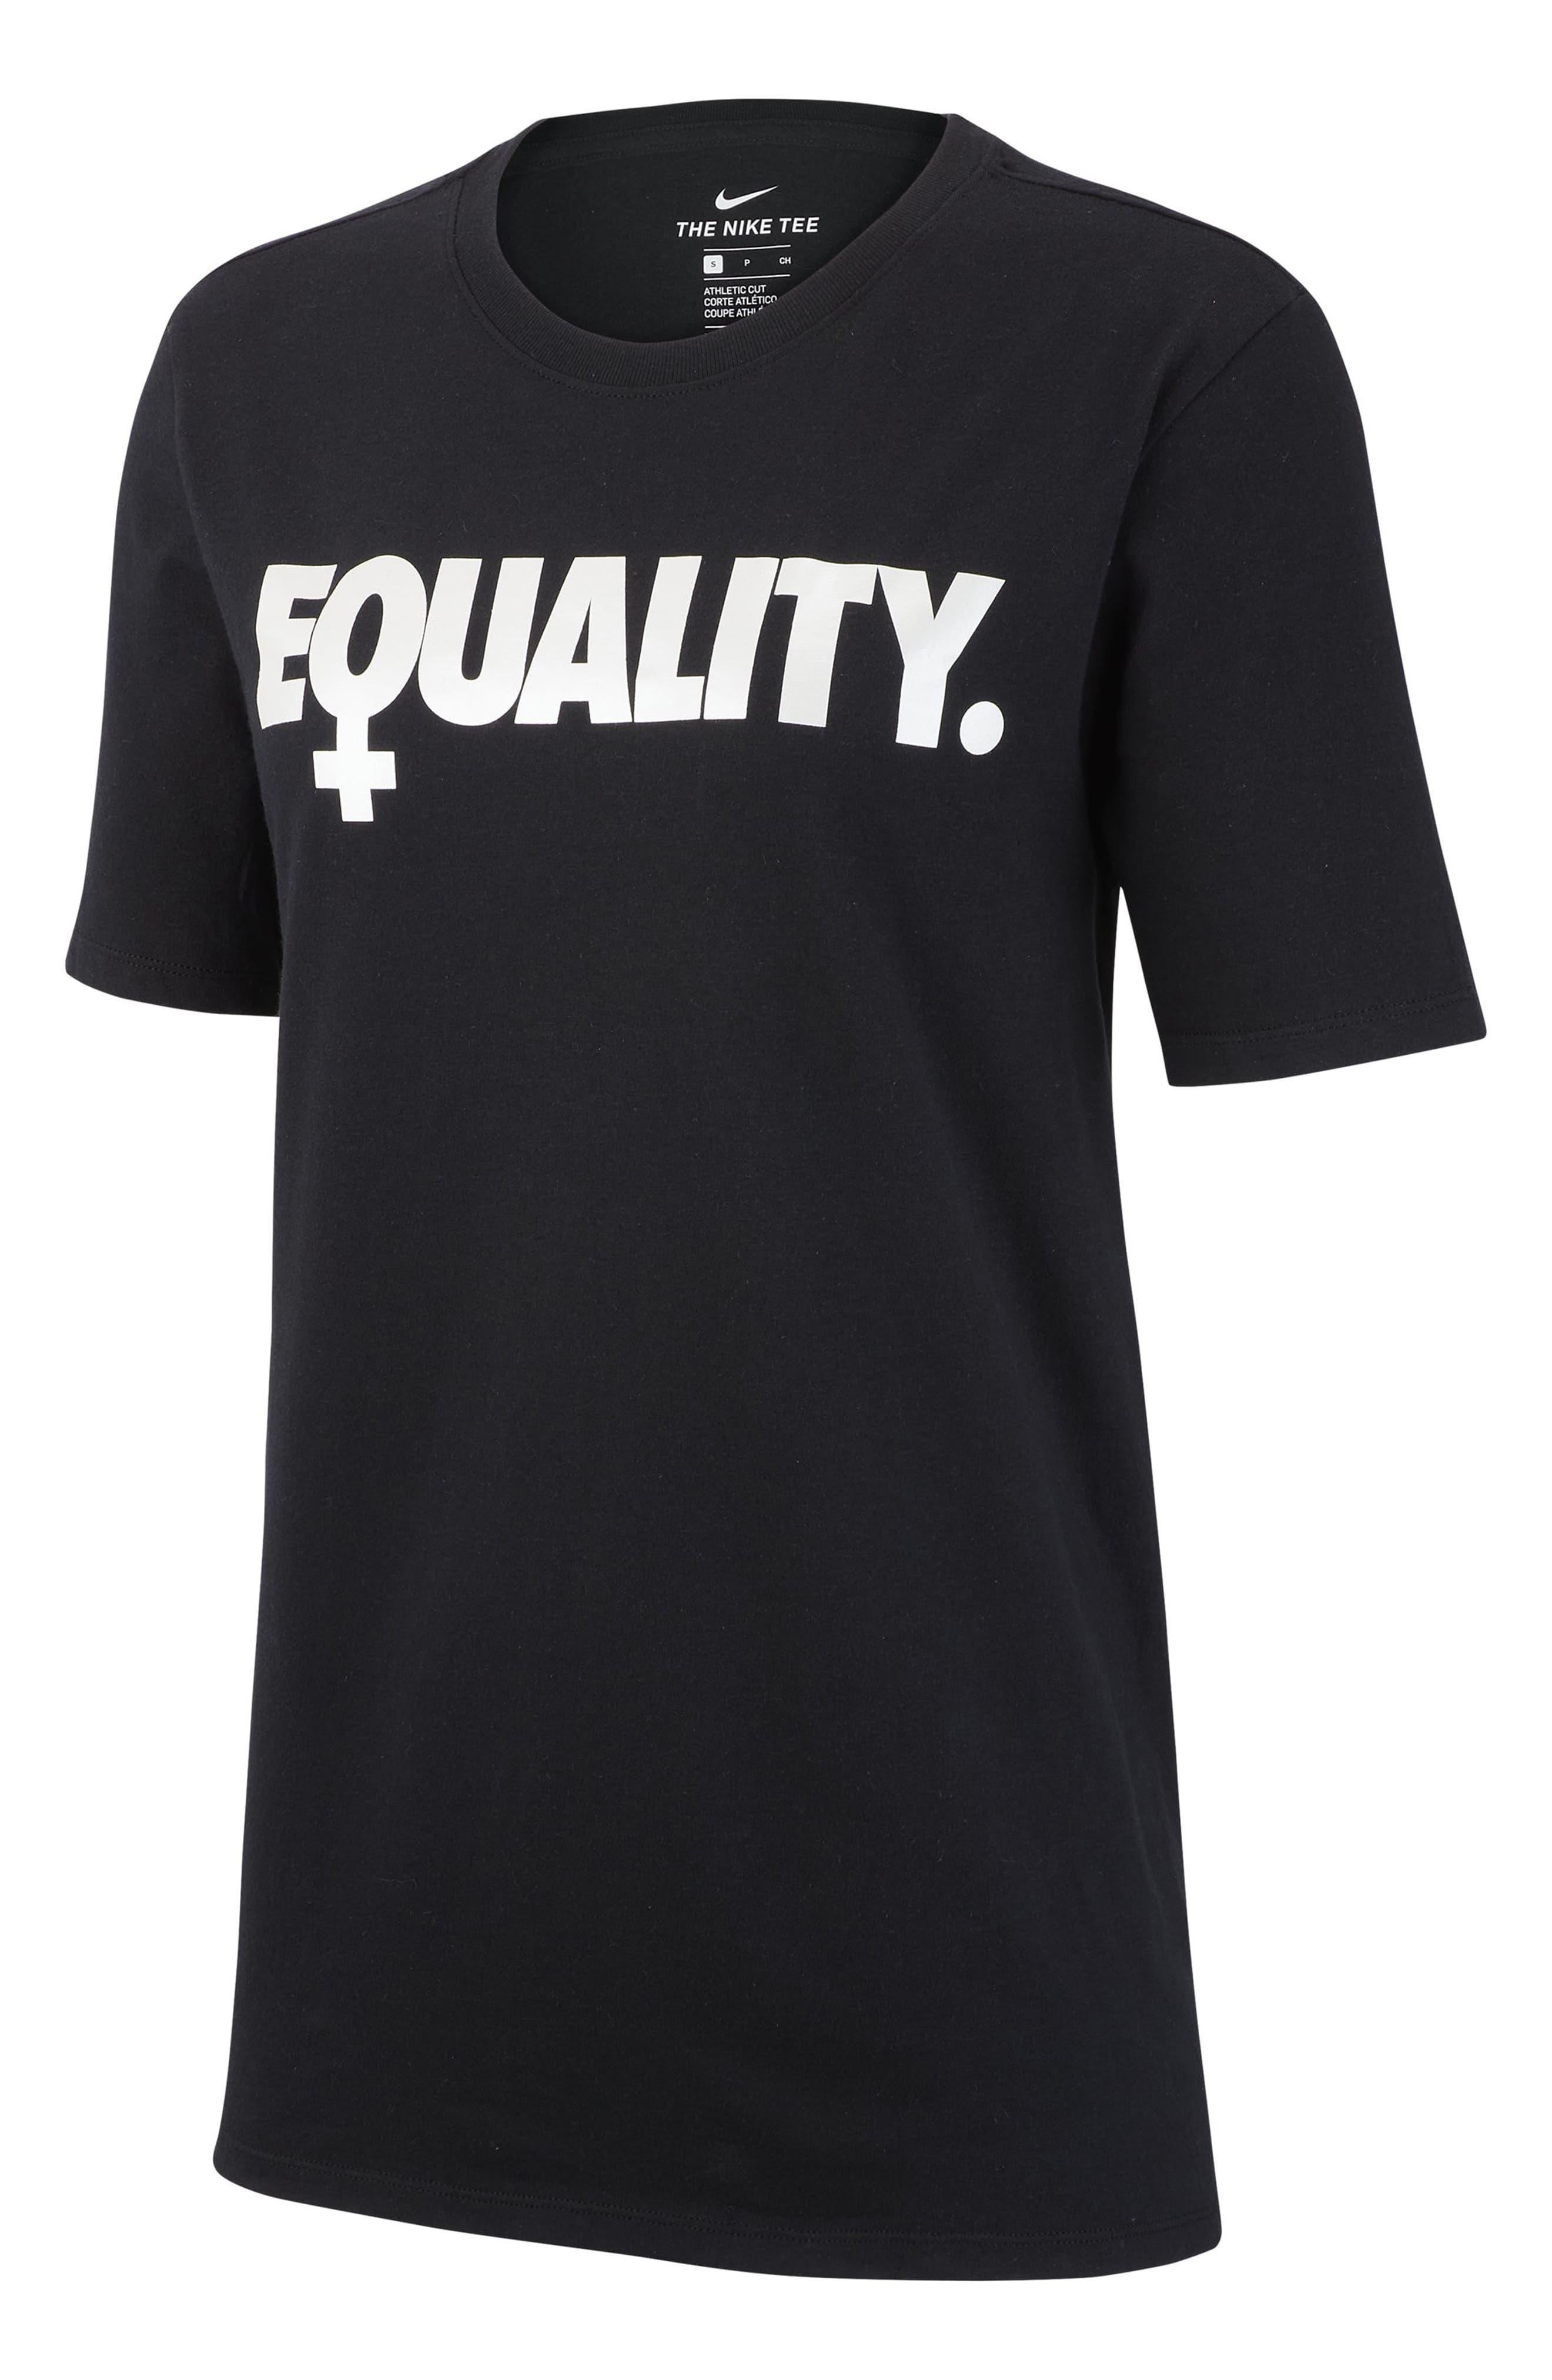 Nike Sportswear Equality T-Shirt